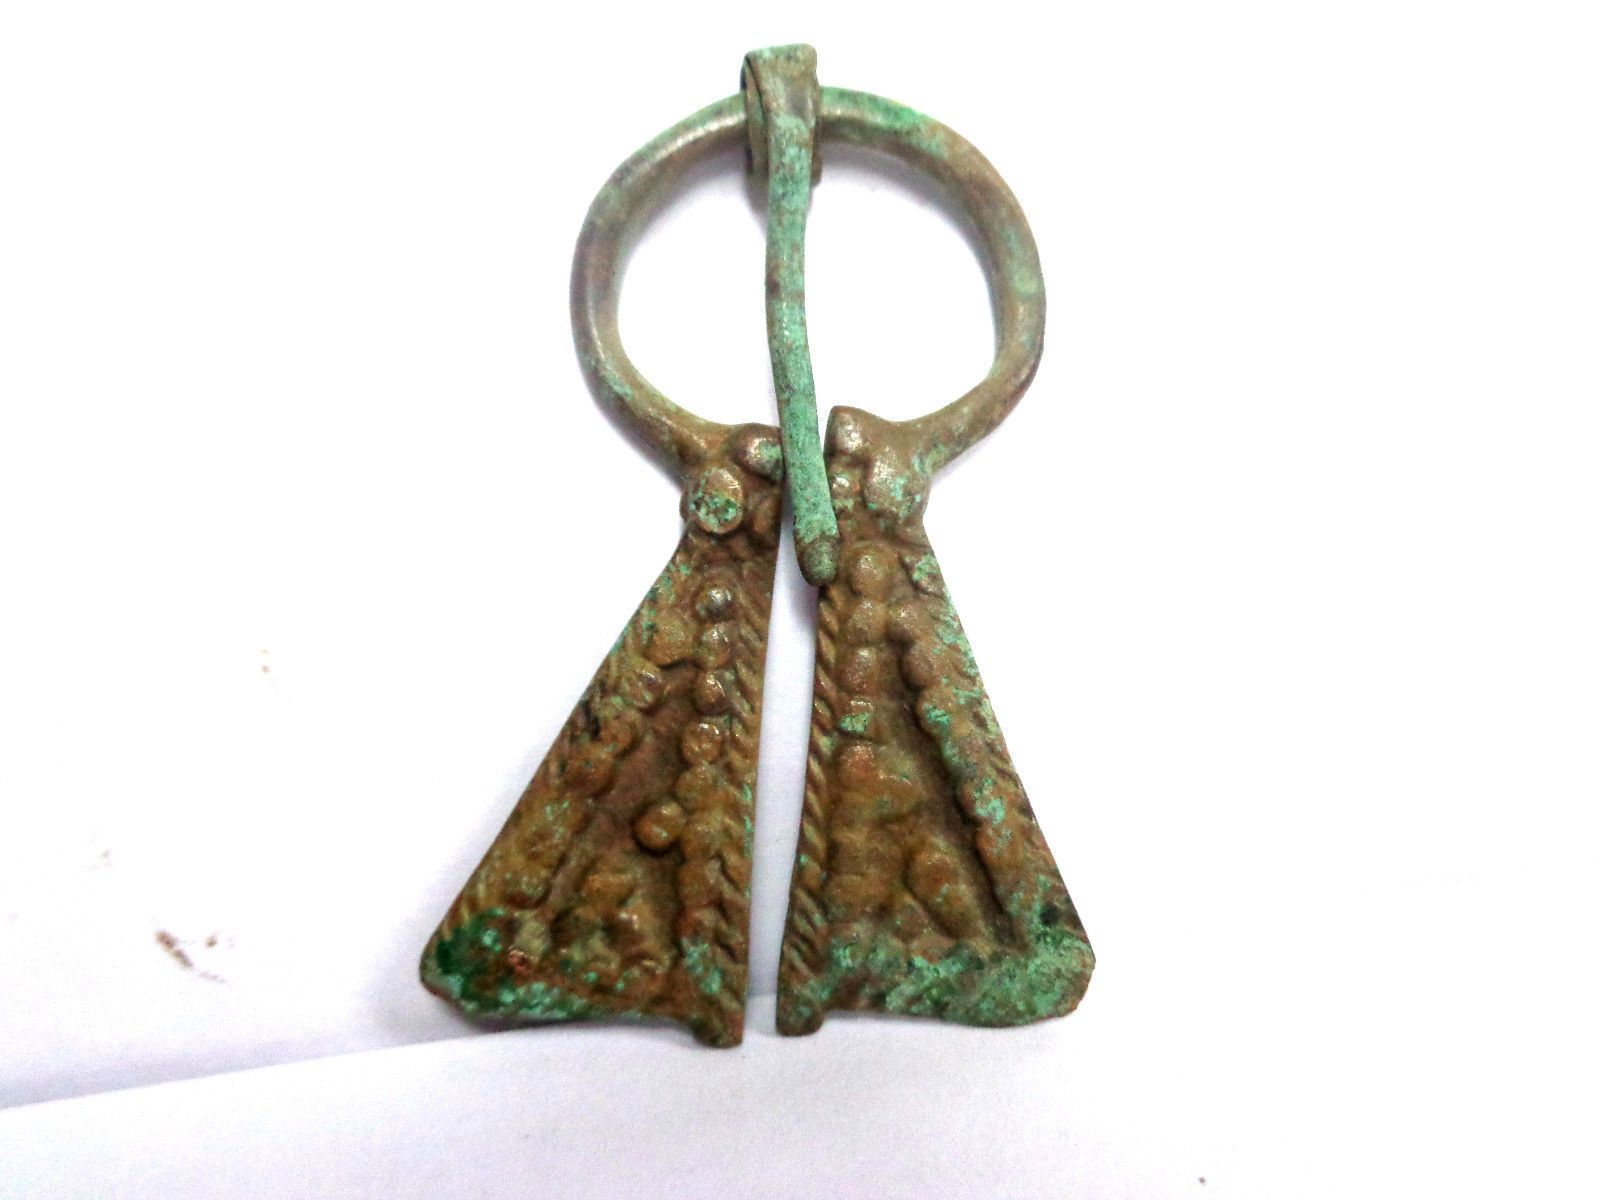 Superb Viking Omega penannular brooch circa 9th-11th century AD   eBay